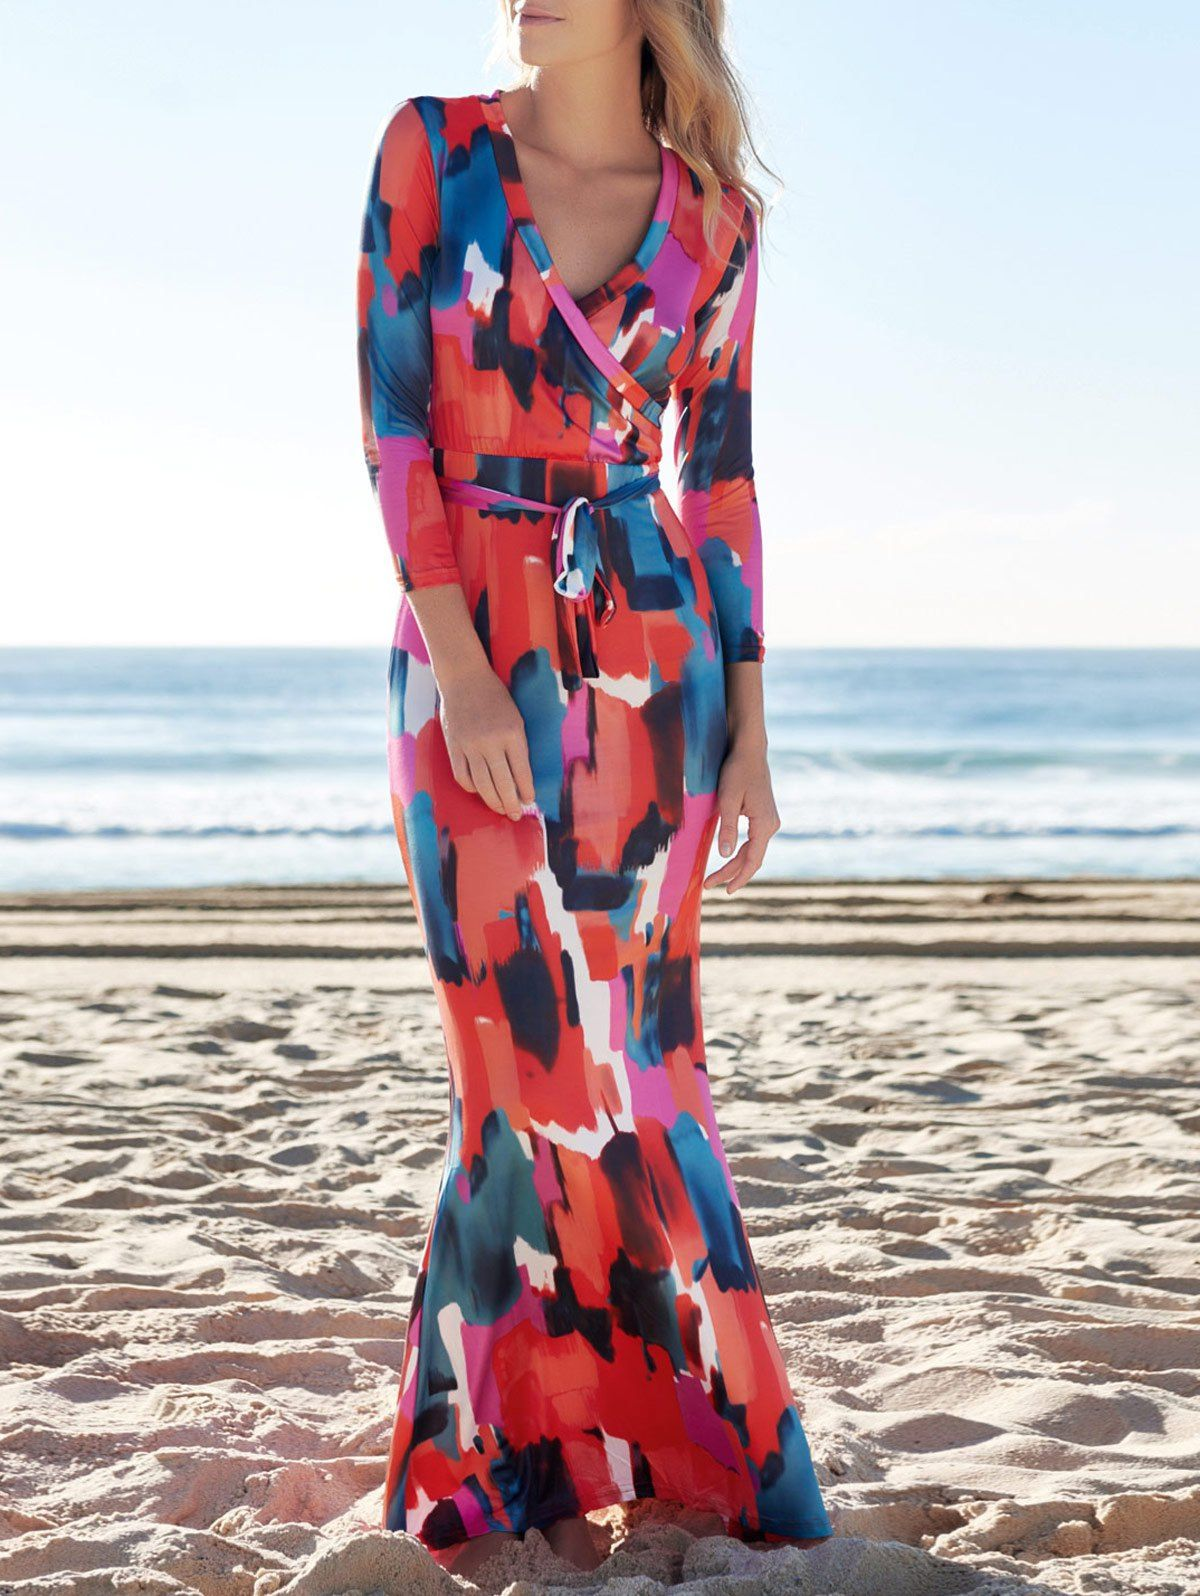 Chic Plunging Neck 3 4 Sleeve Geometric Pattern Maxi Dress For Women Maxi Dress Maxi Dress With Sleeves Maxi Dress Pattern